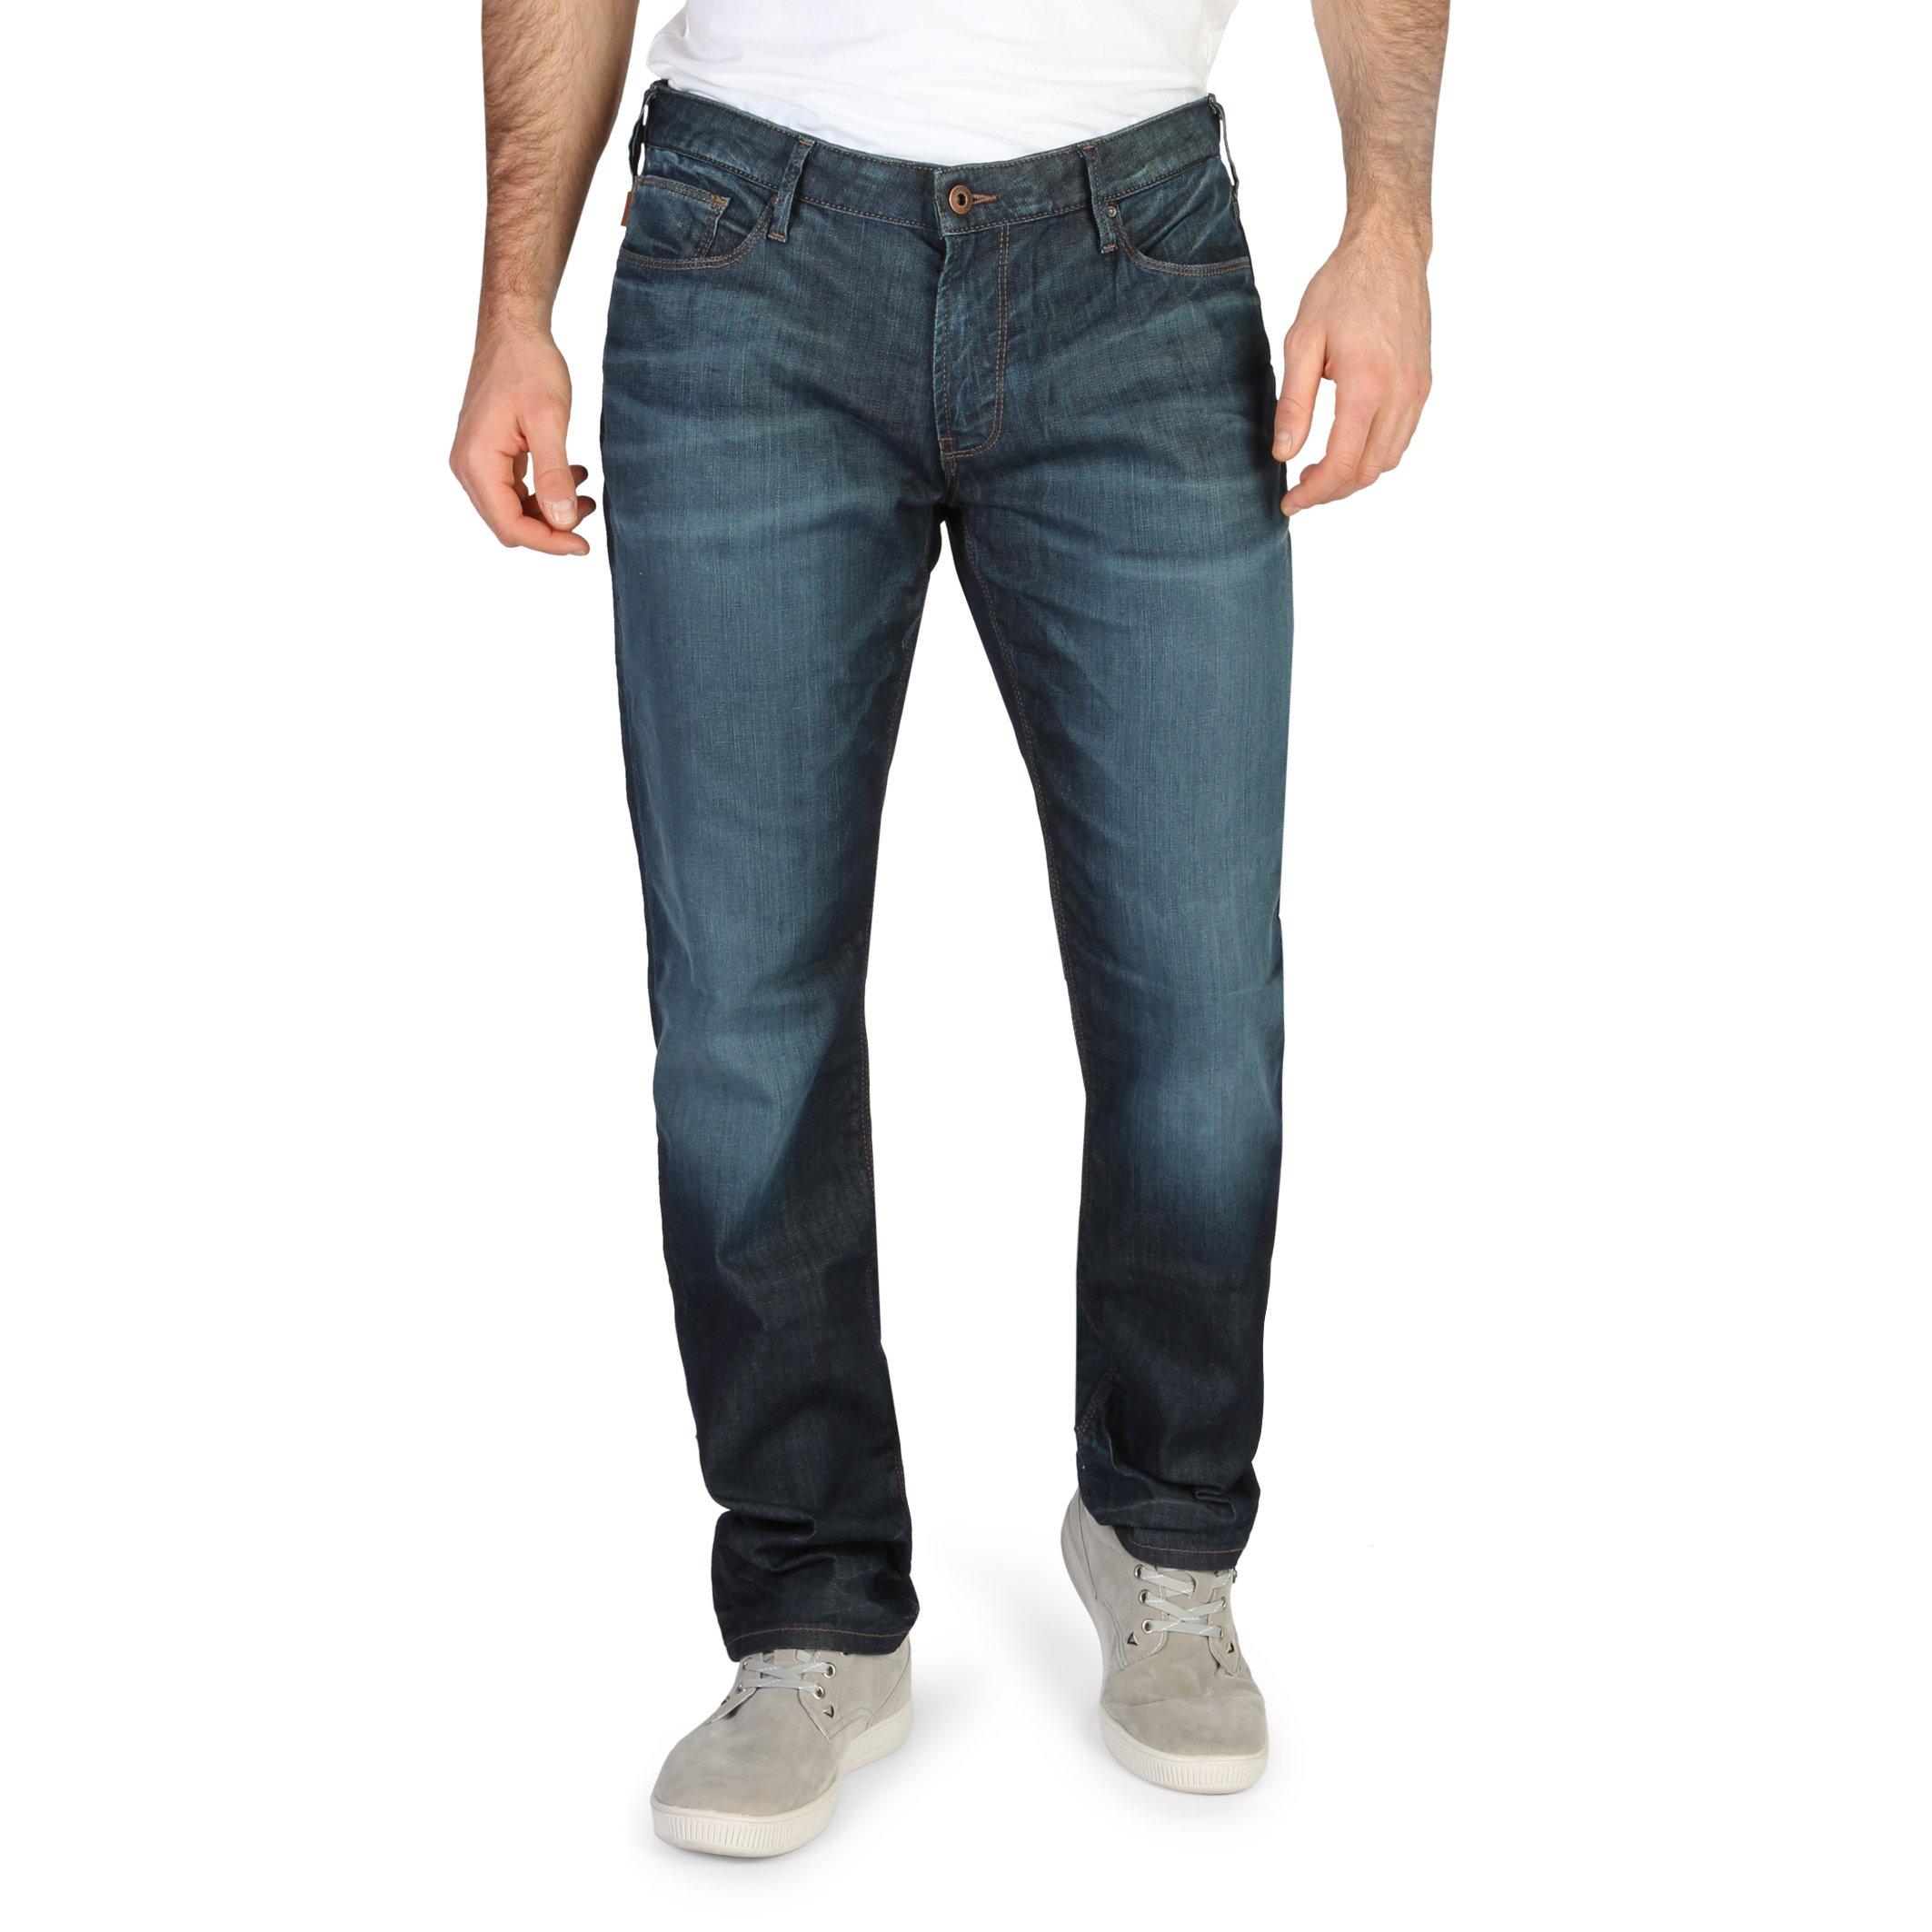 Emporio Armani Men's Jeans Blue 330055 - blue-1 27